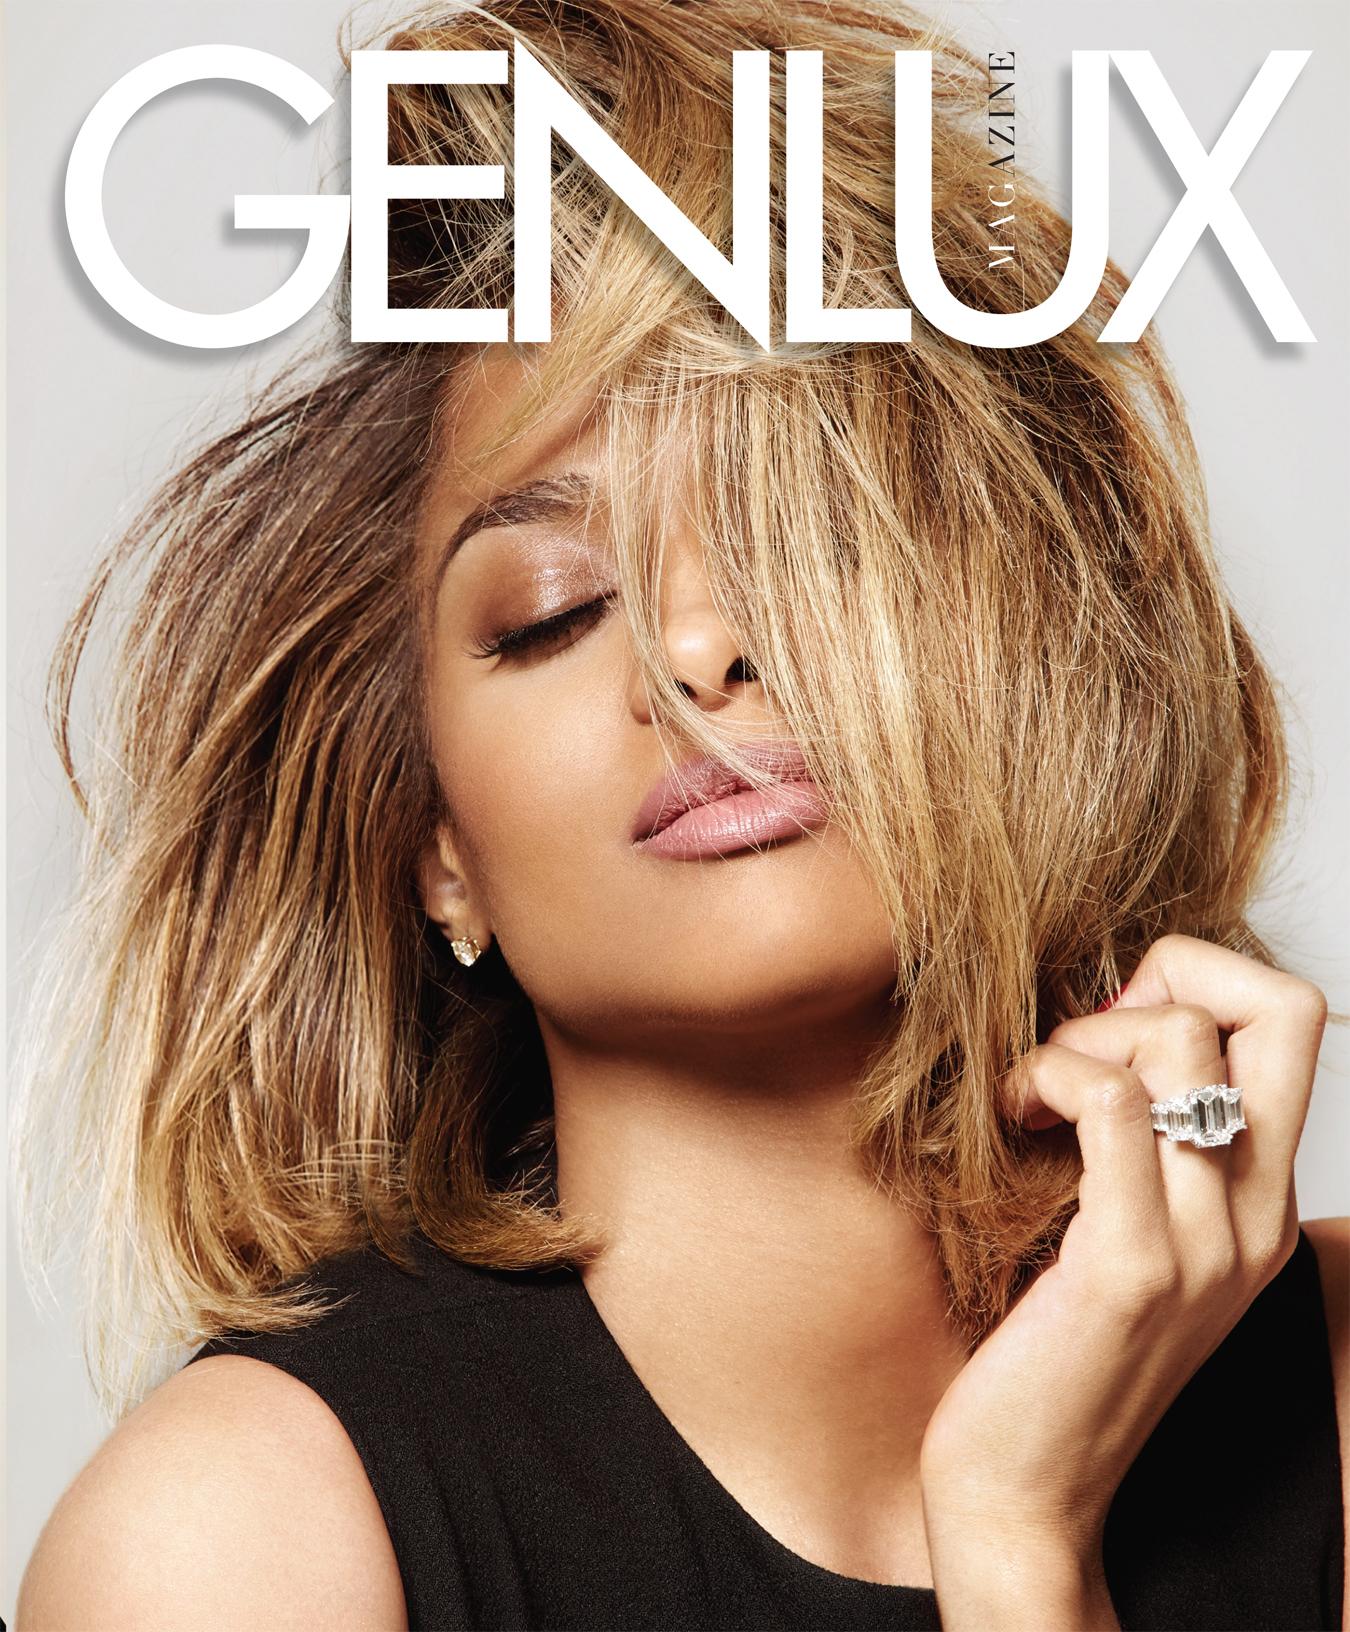 genlux ciara cover - version A